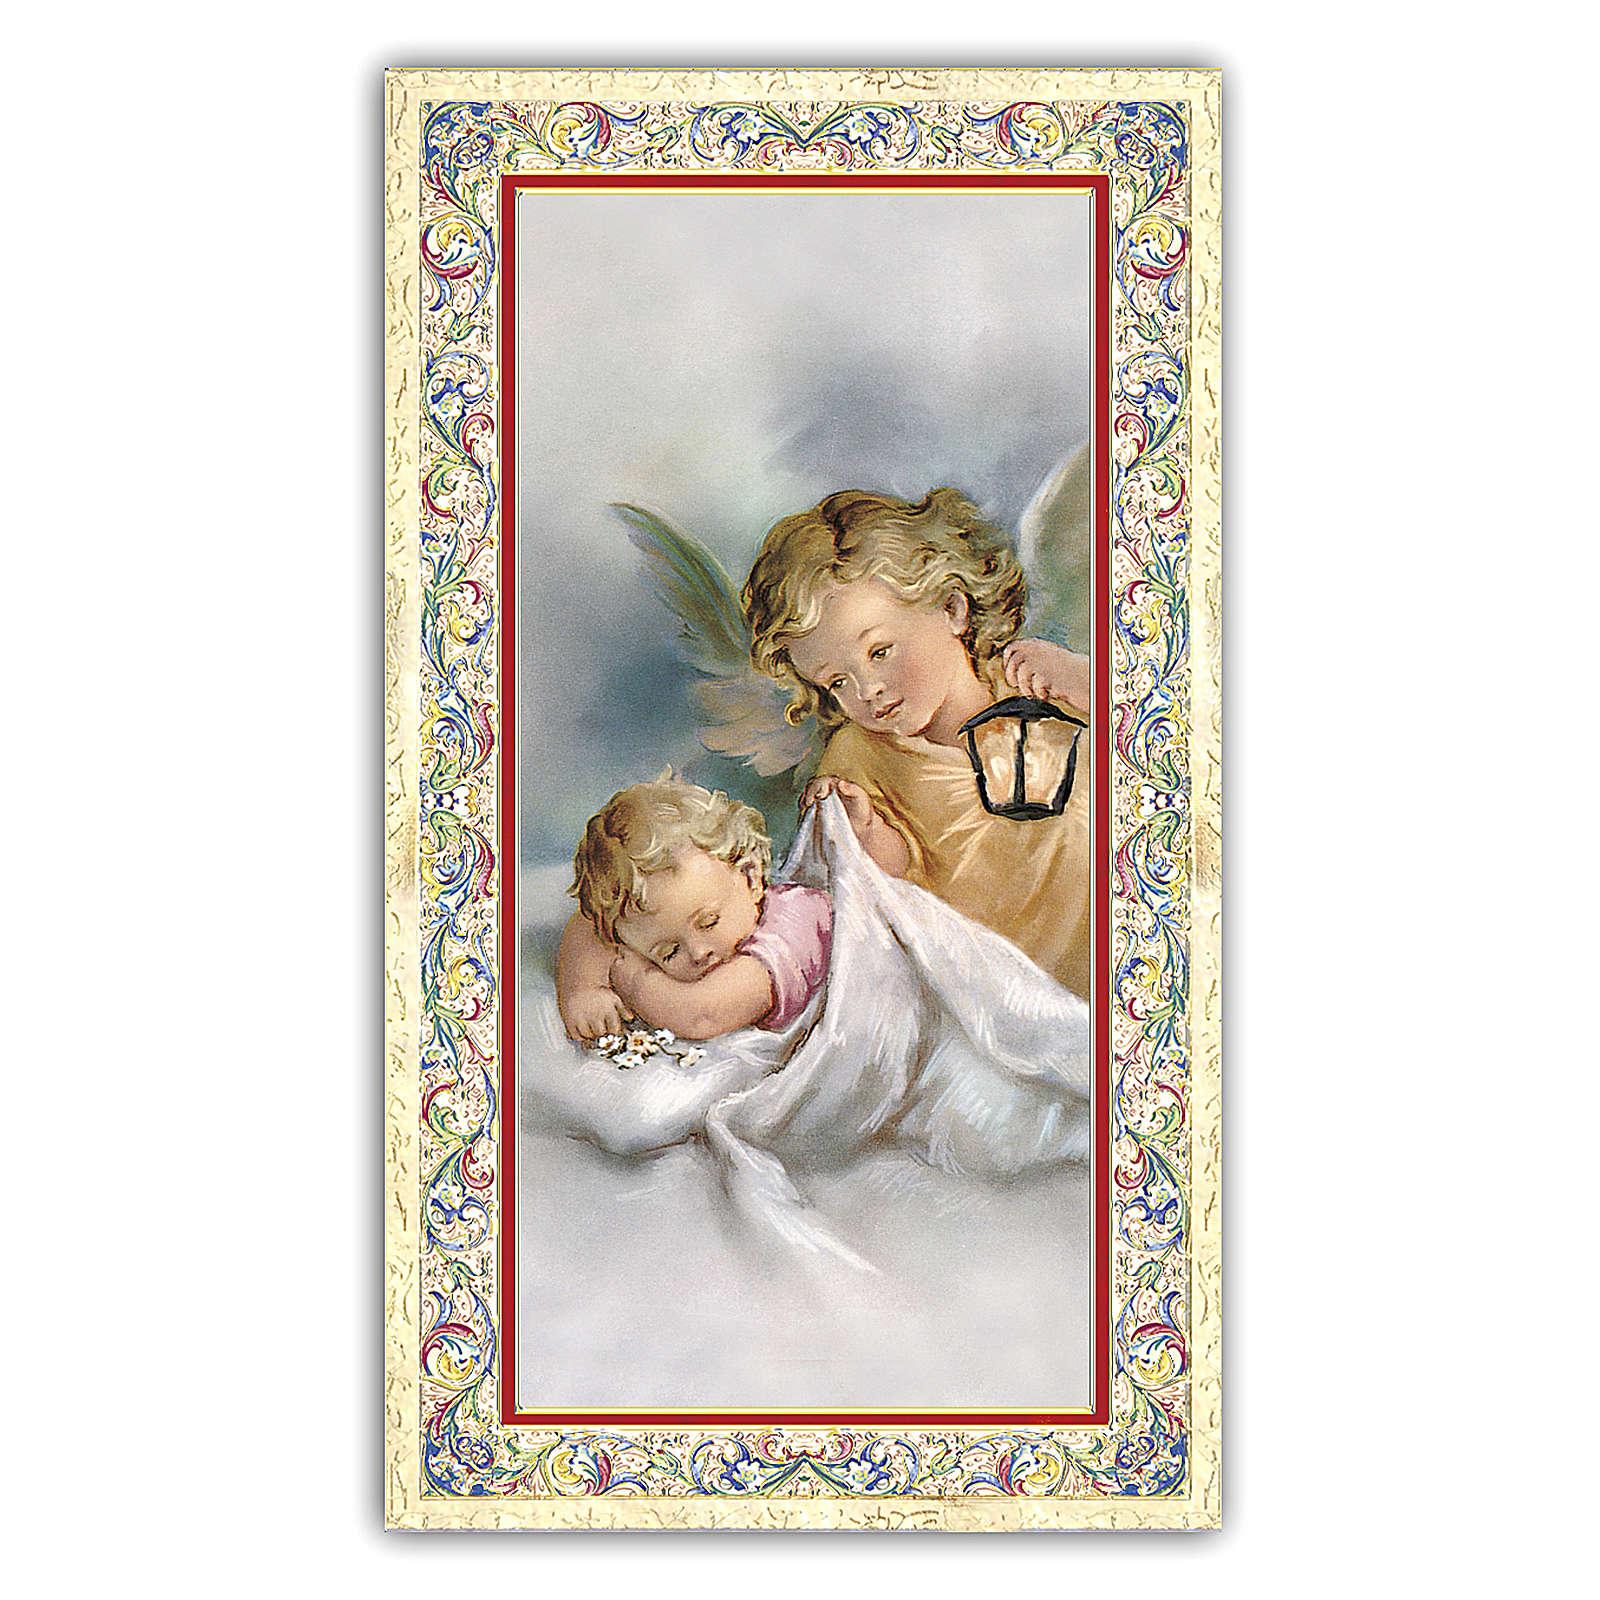 Estampa religiosa Ángel de la Guarda con la linterna 10x5 cm ITA 4